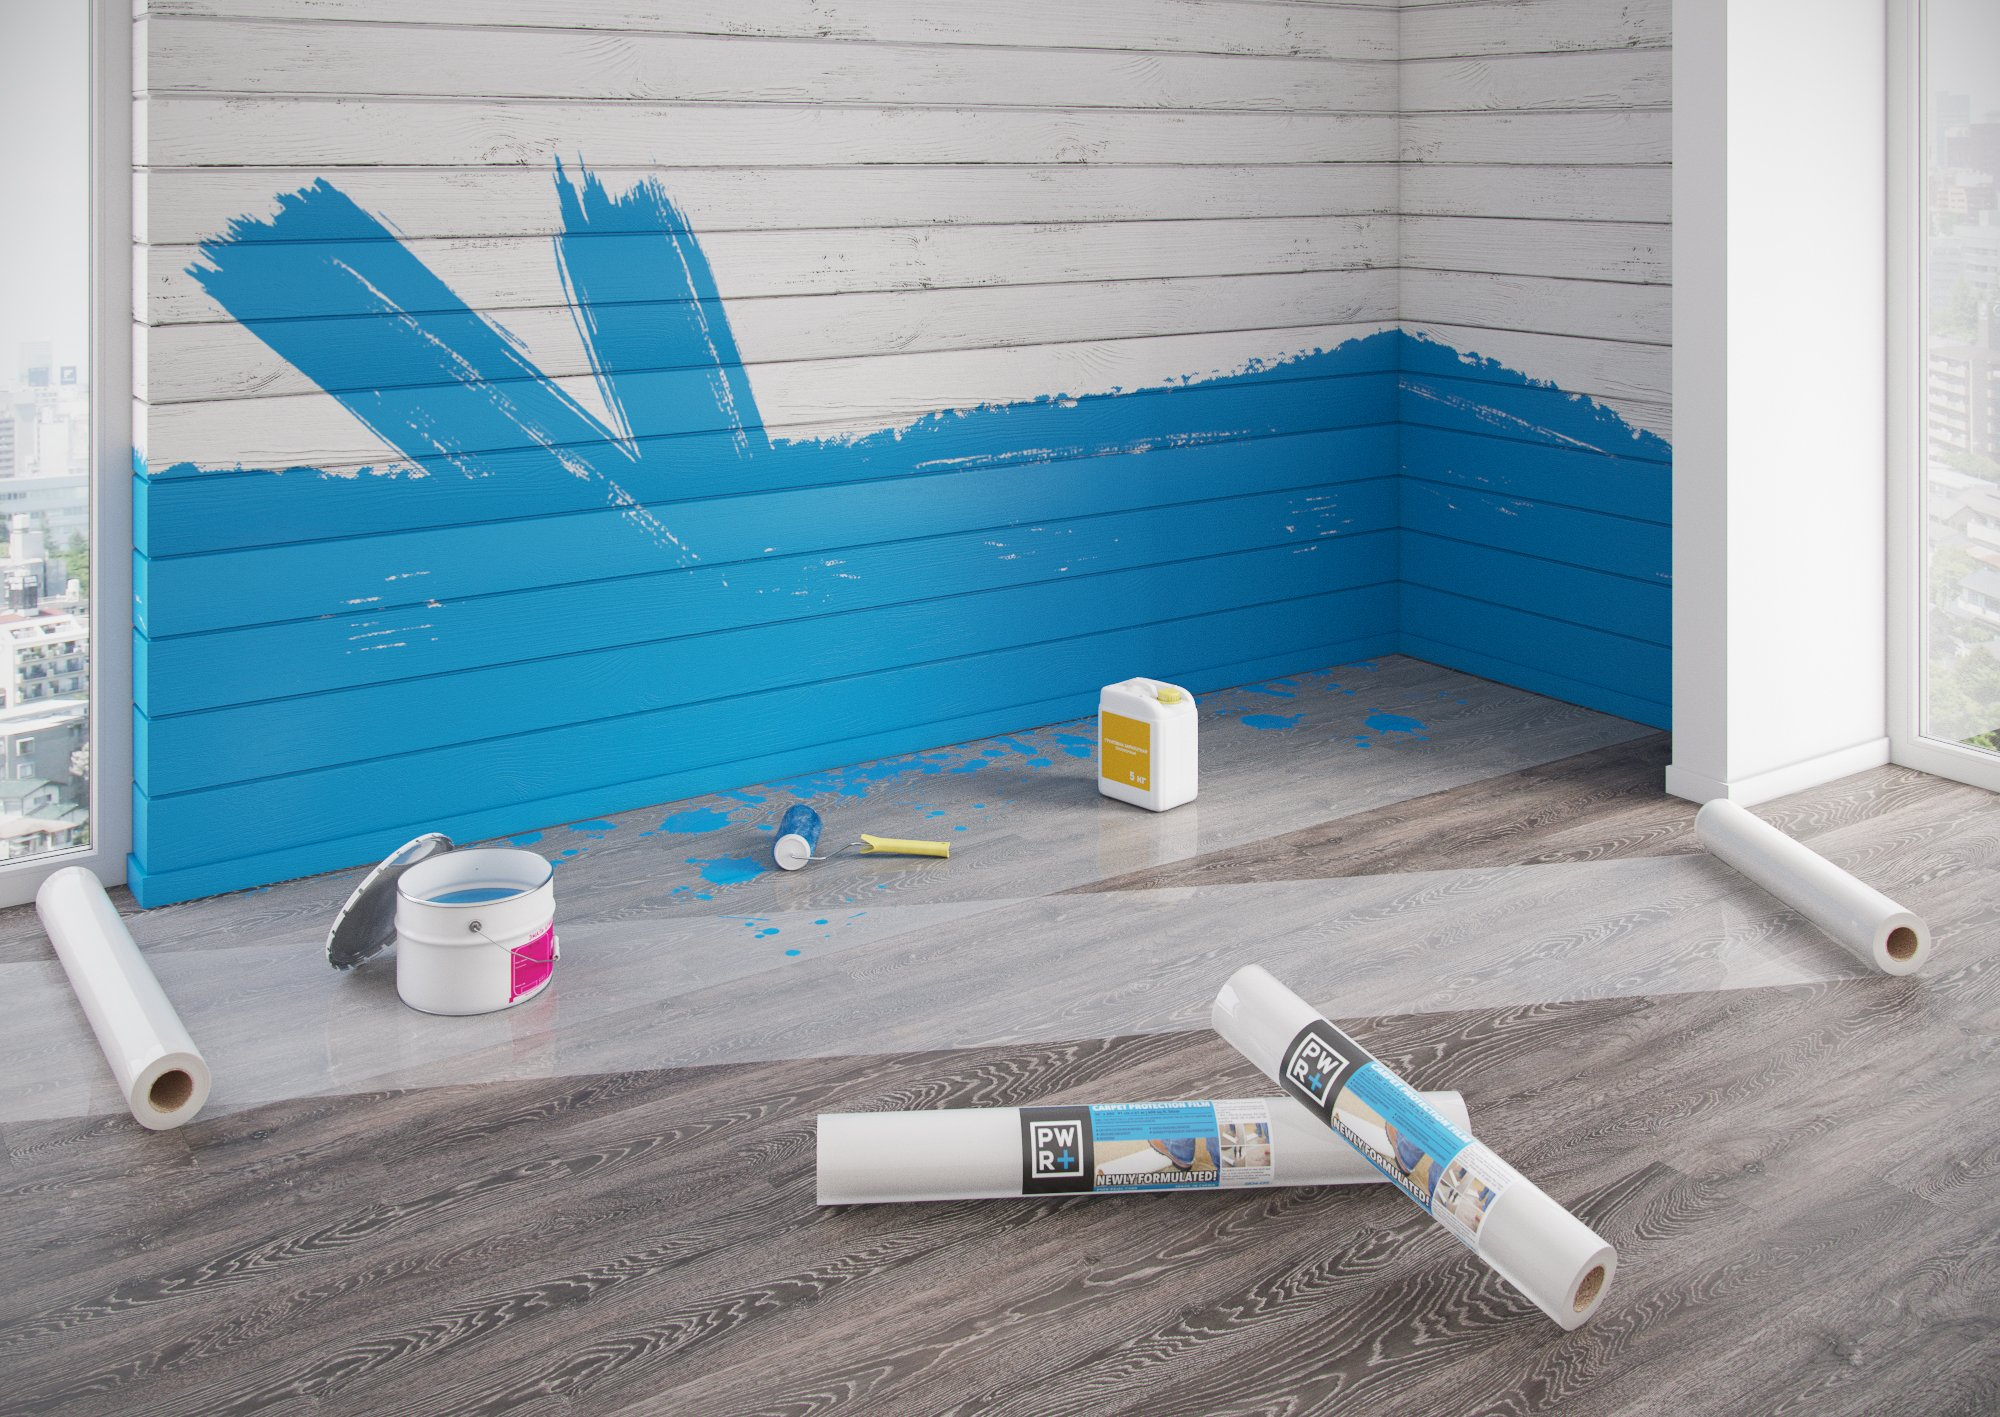 Plastic Carpet Protector For Painting Carpet Vidalondon